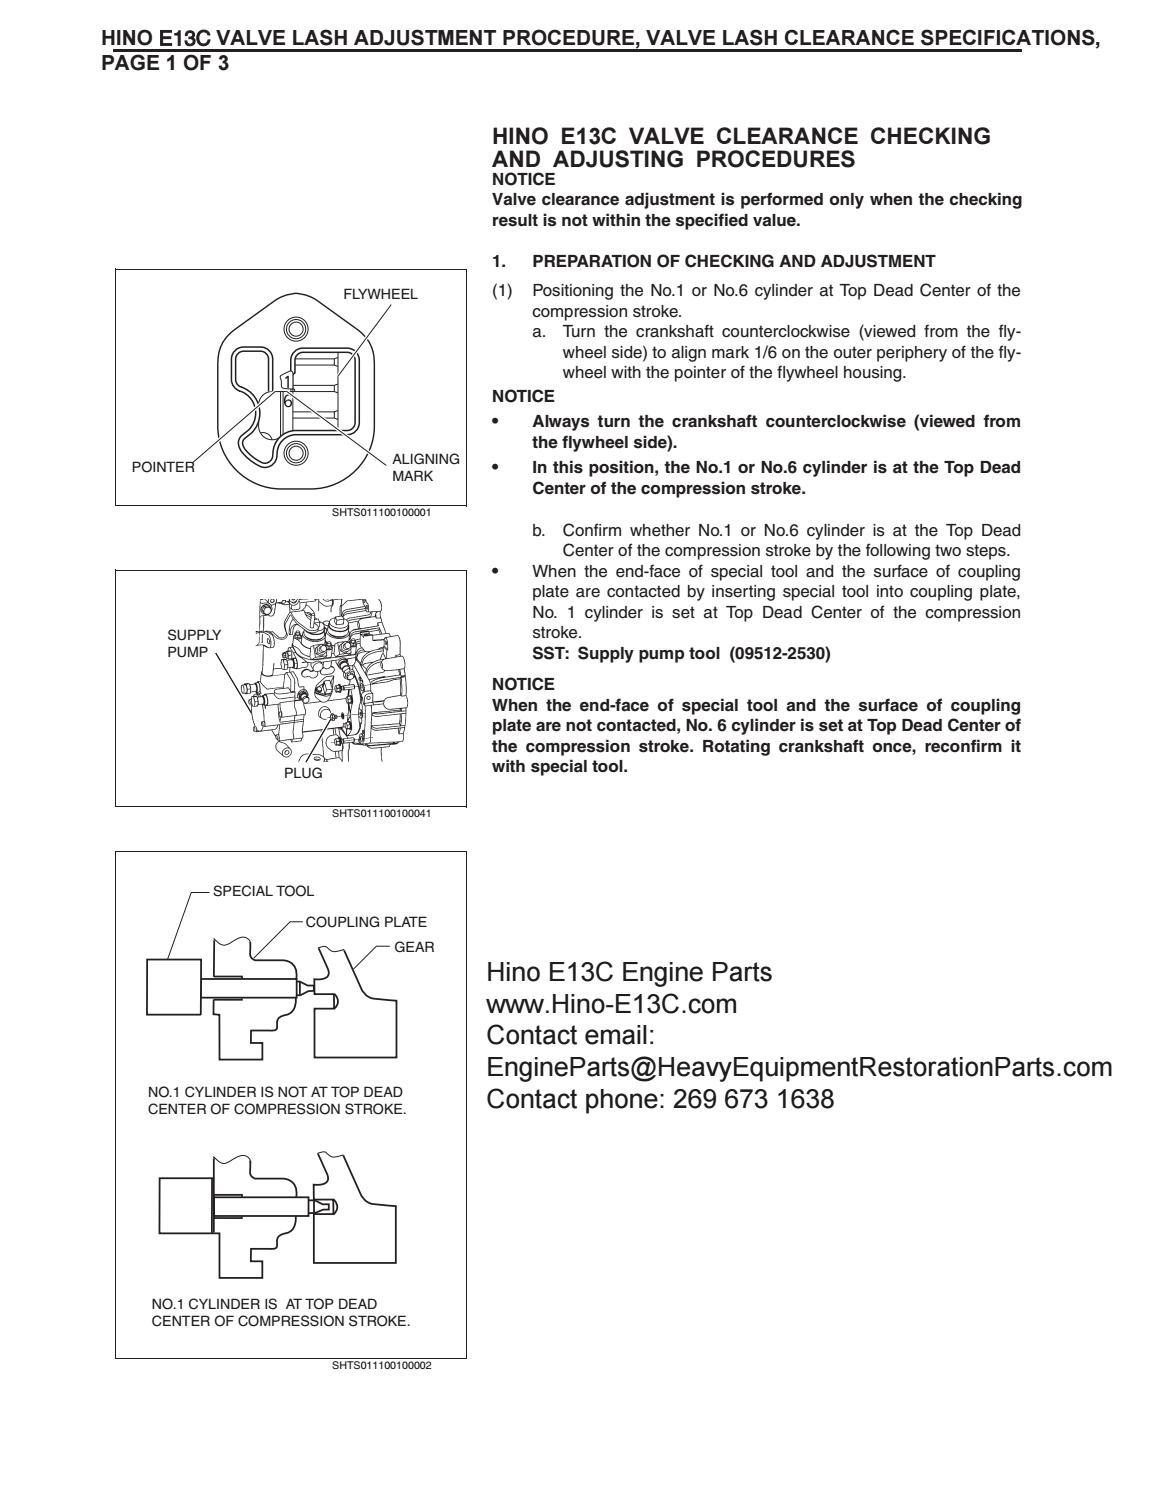 Hino E13C Valve Adjustment Procedure, Valve Lash Clearance